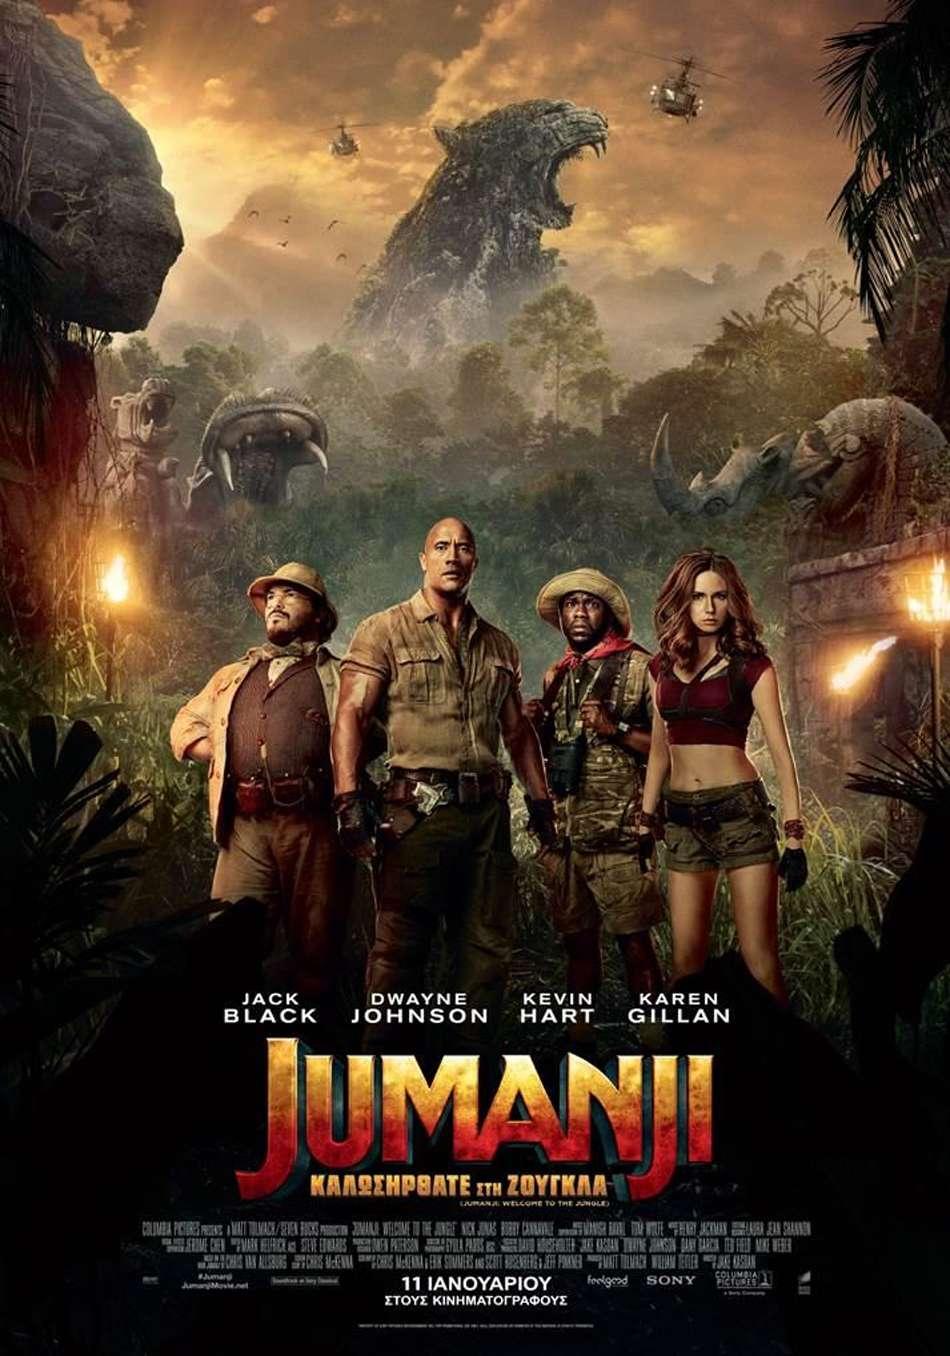 Jumanji: Καλωσήρθατε στη ζούγκλα (Jumanji: Welcome To The Jungle) Poster Πόστερ